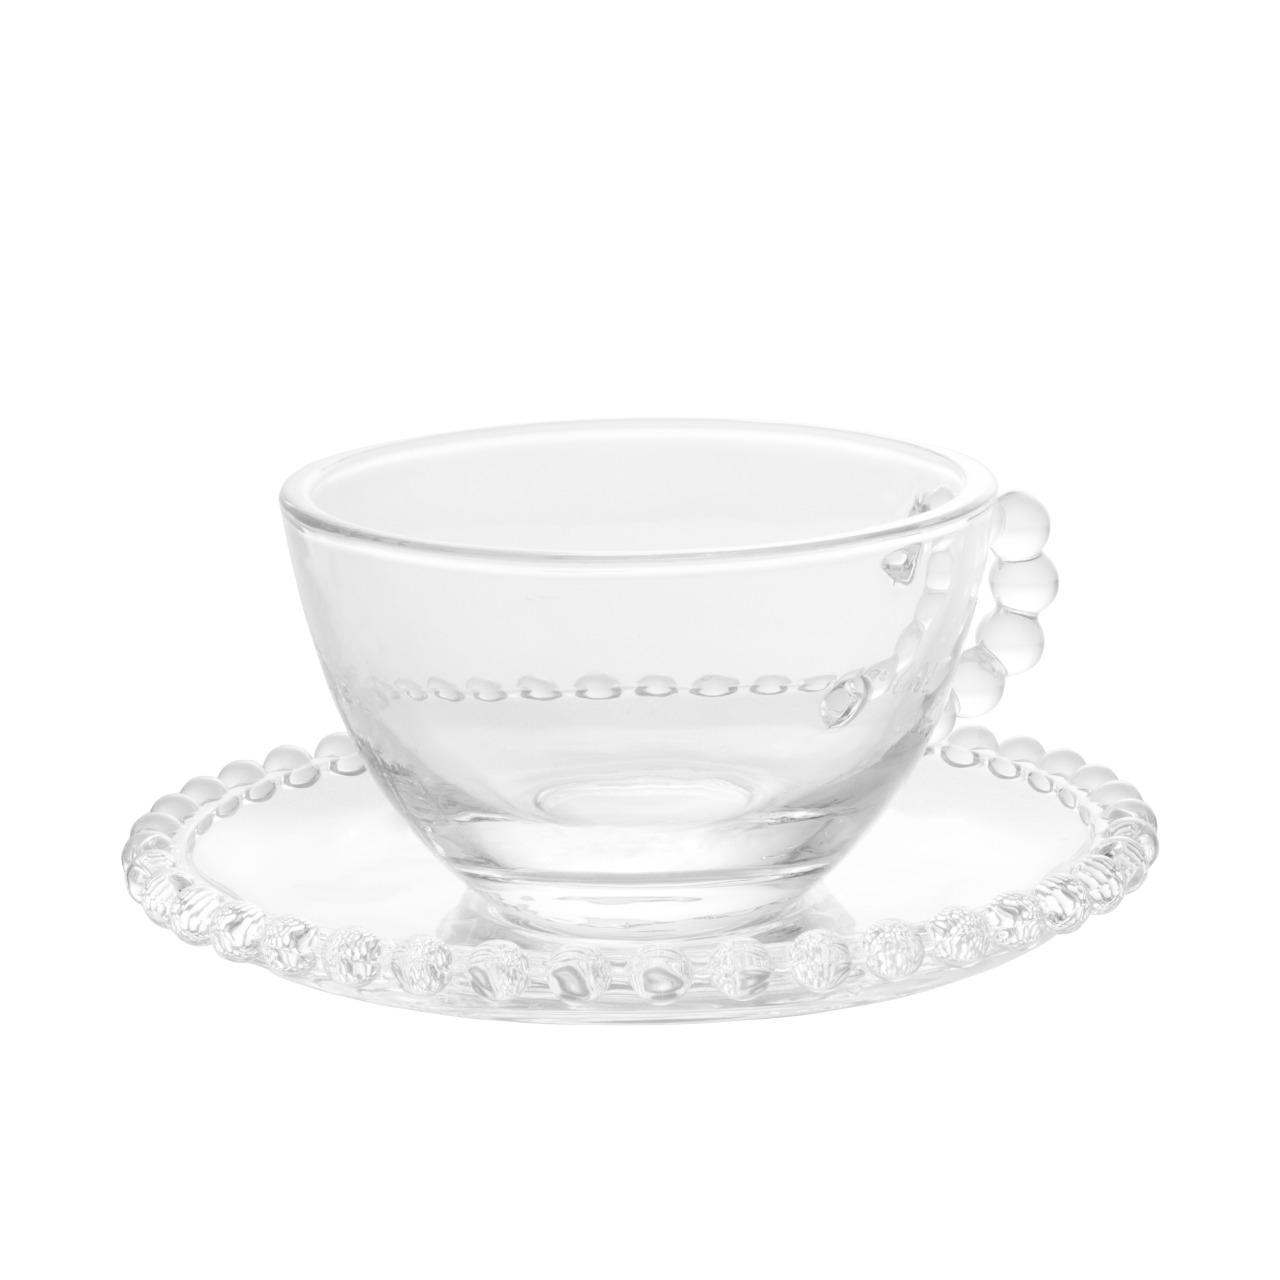 Conjunto 4 Xícaras de Chá Cristal com Pires Pearl 180ml - Wolff